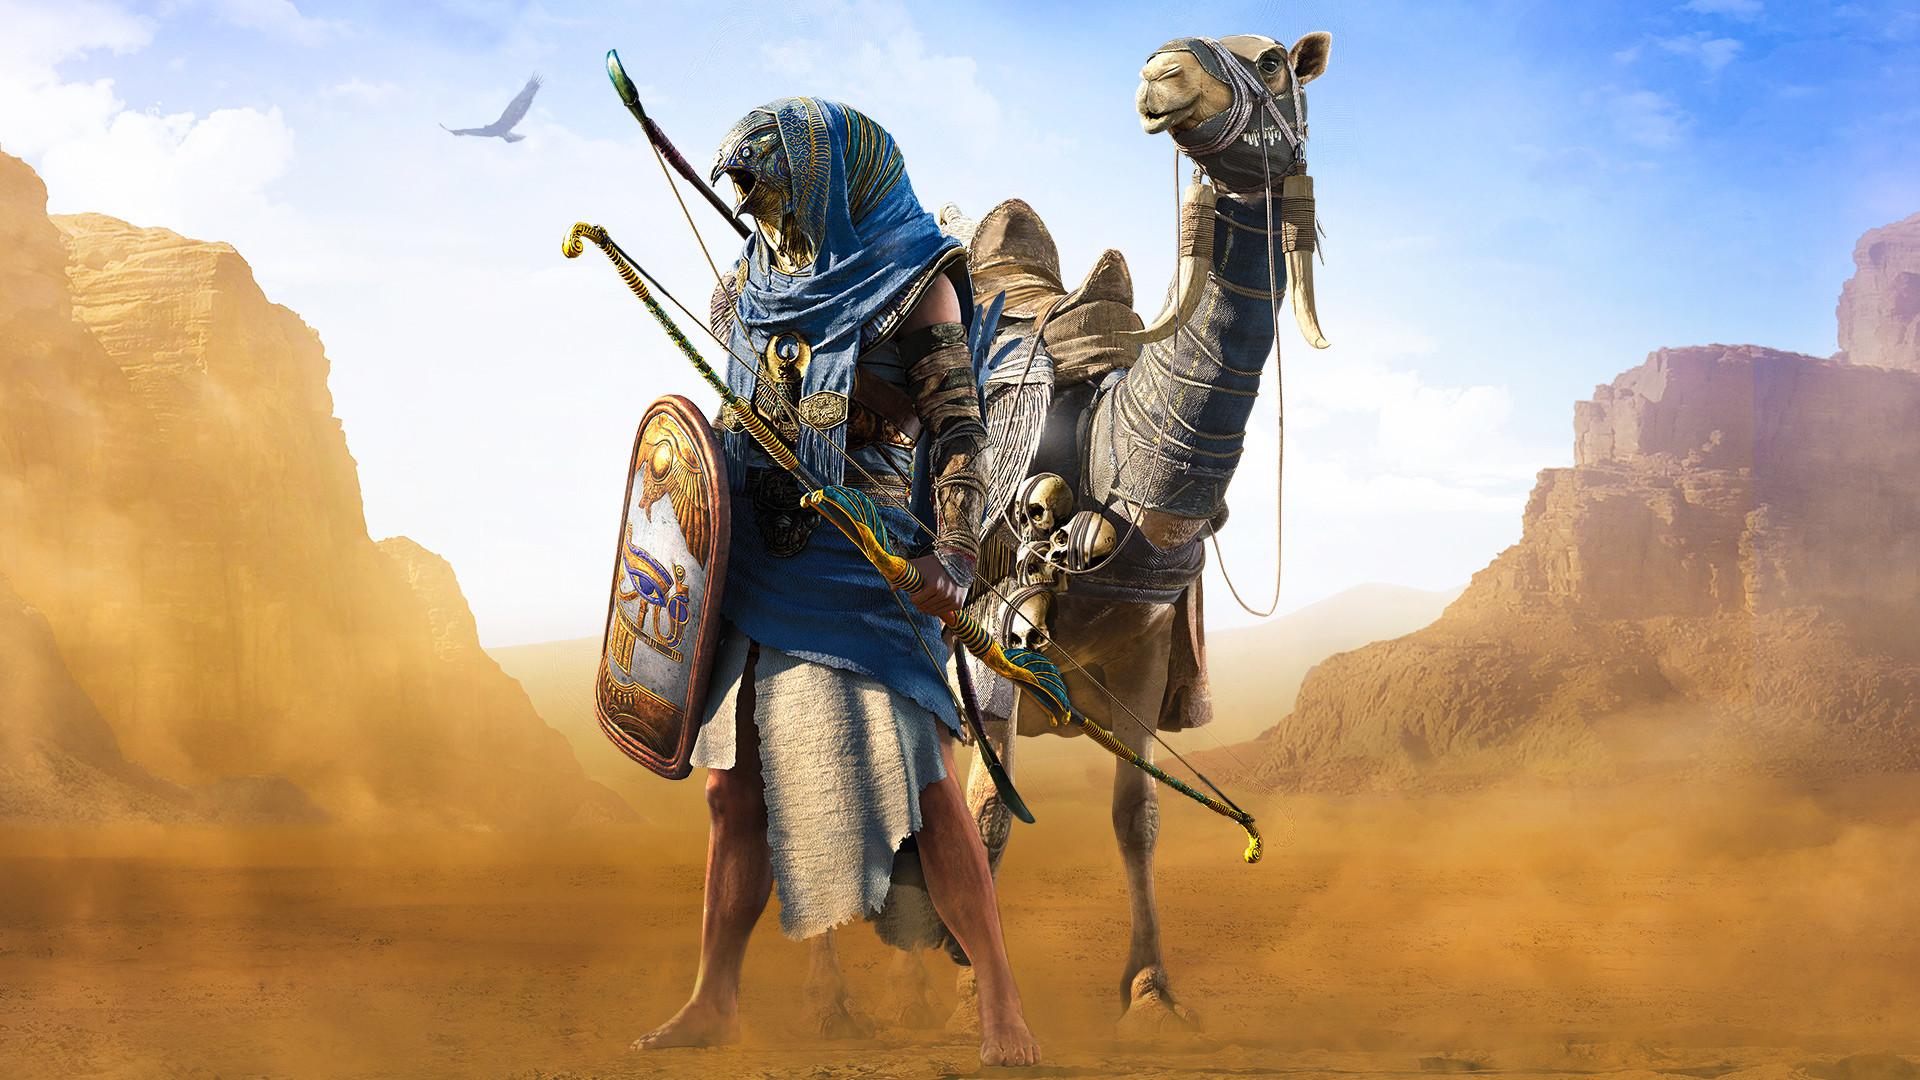 Desktop Wallpaper Horus Assassin S Creed Origins Game Desert Hd Image Picture Background 7019dd